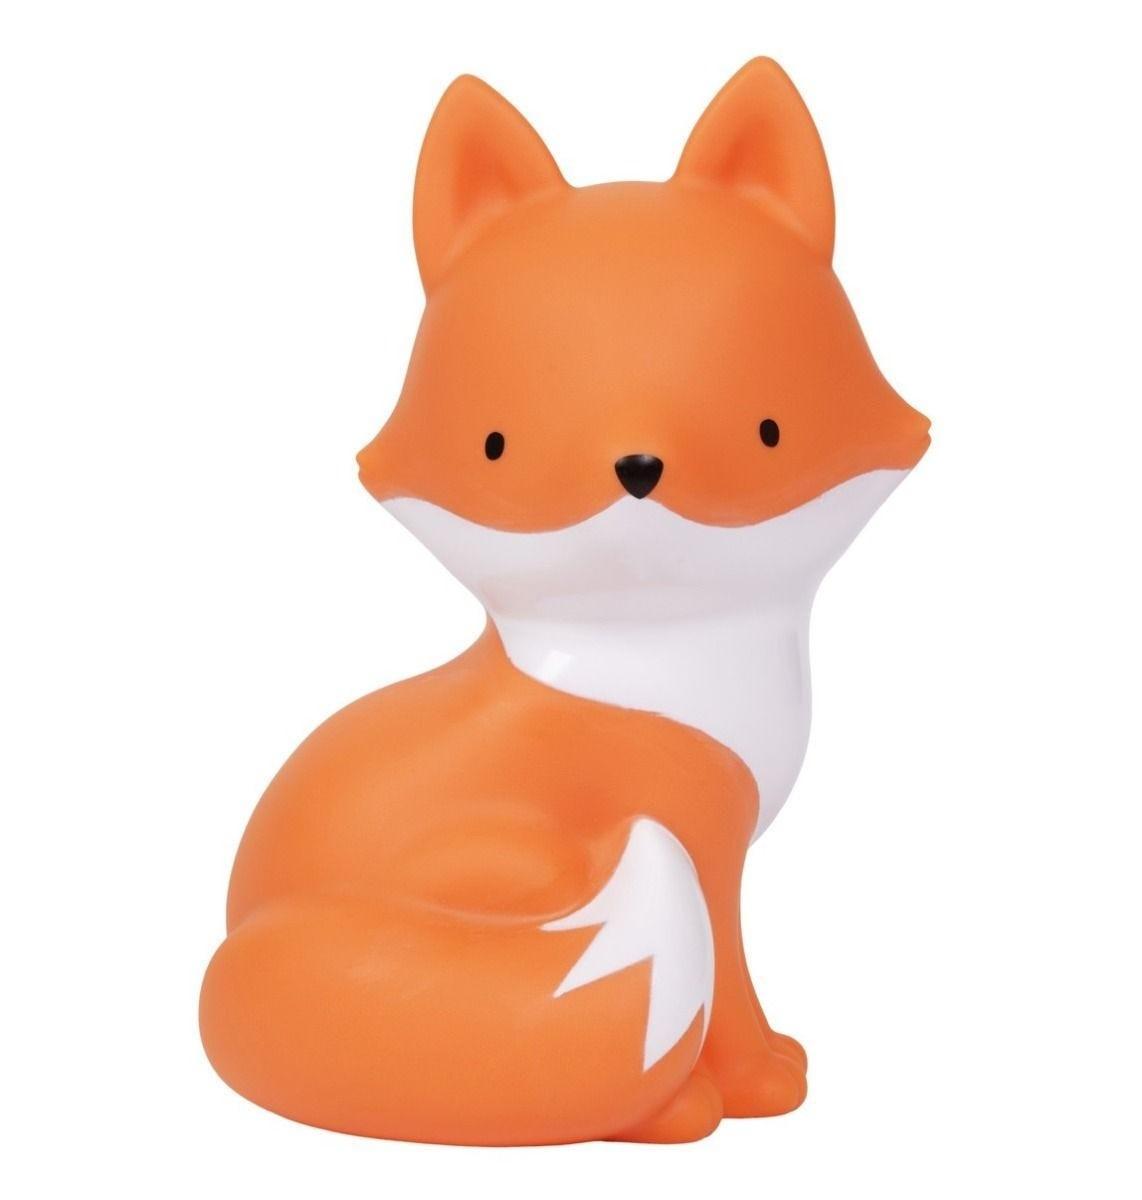 A Little Lovely Company - Little light: Fox